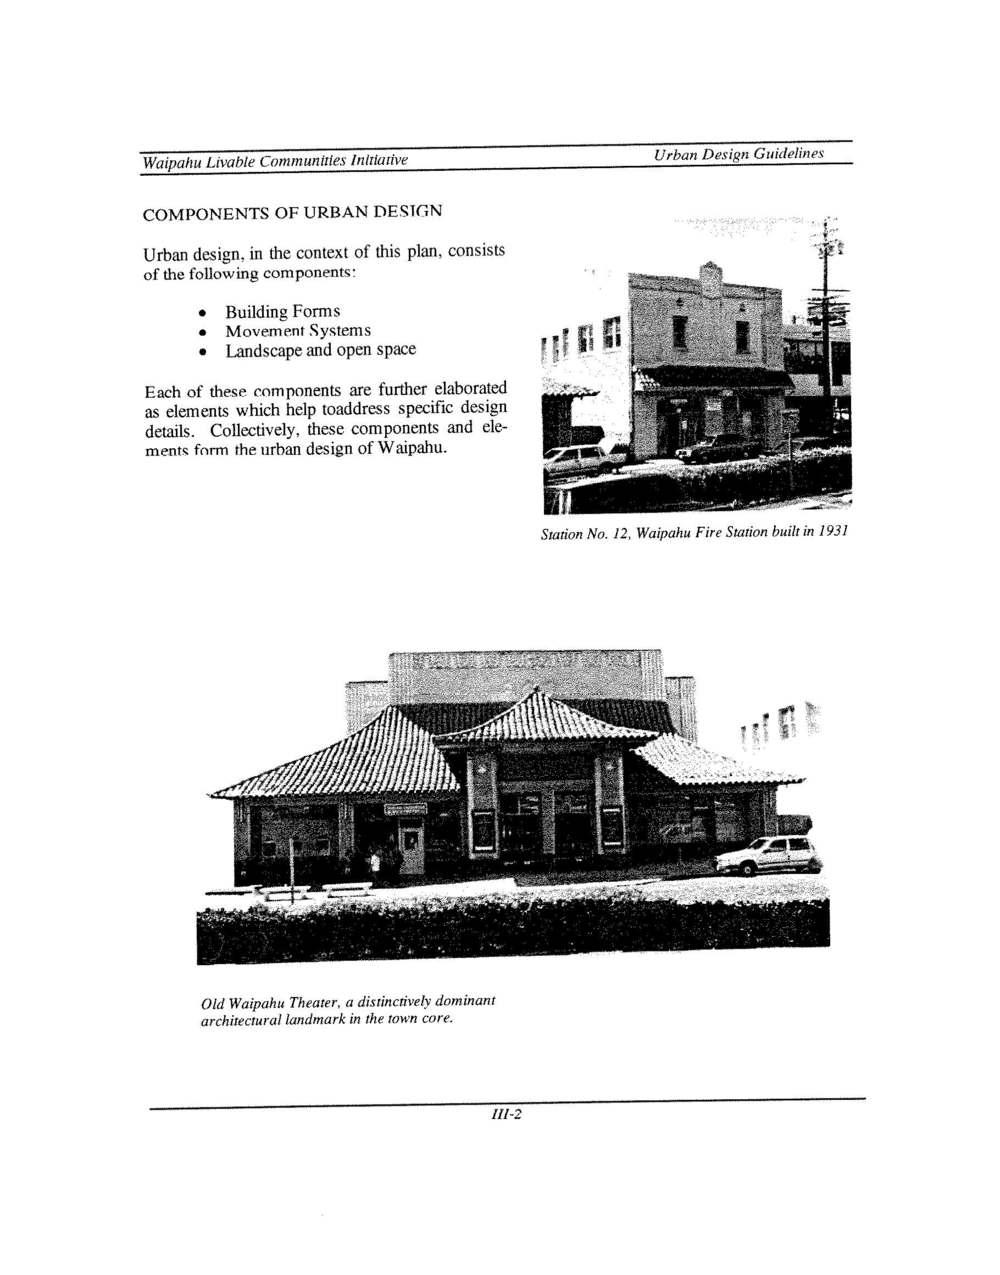 160531_WaipahuLivableCommunities(1998)_Page_092.jpg